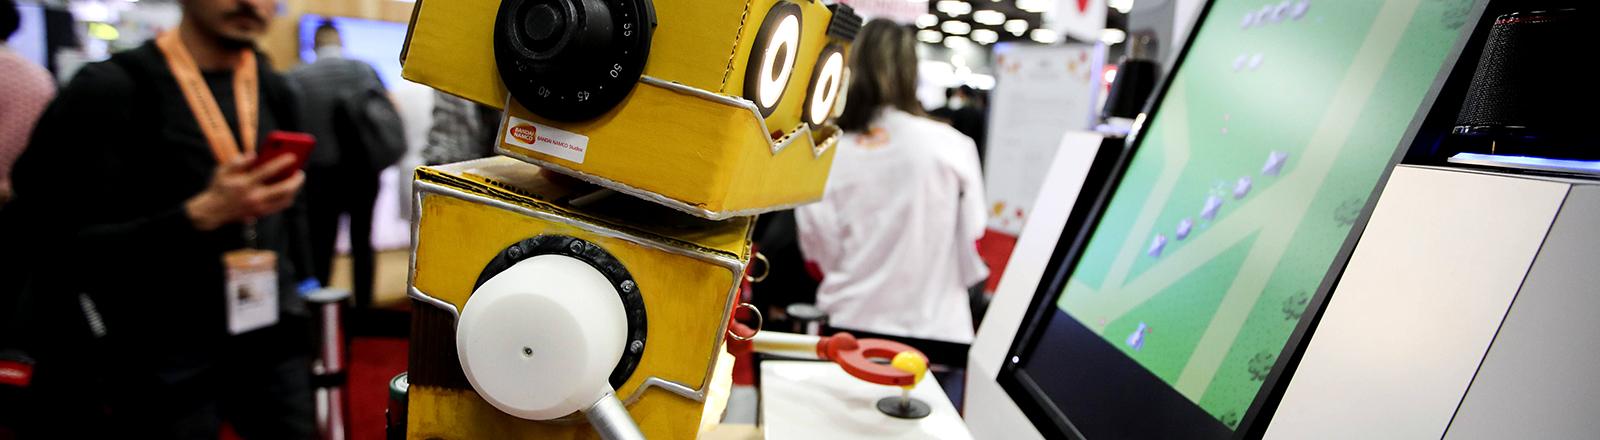 Roboter beim SXSW-Festival in Austin 2019.